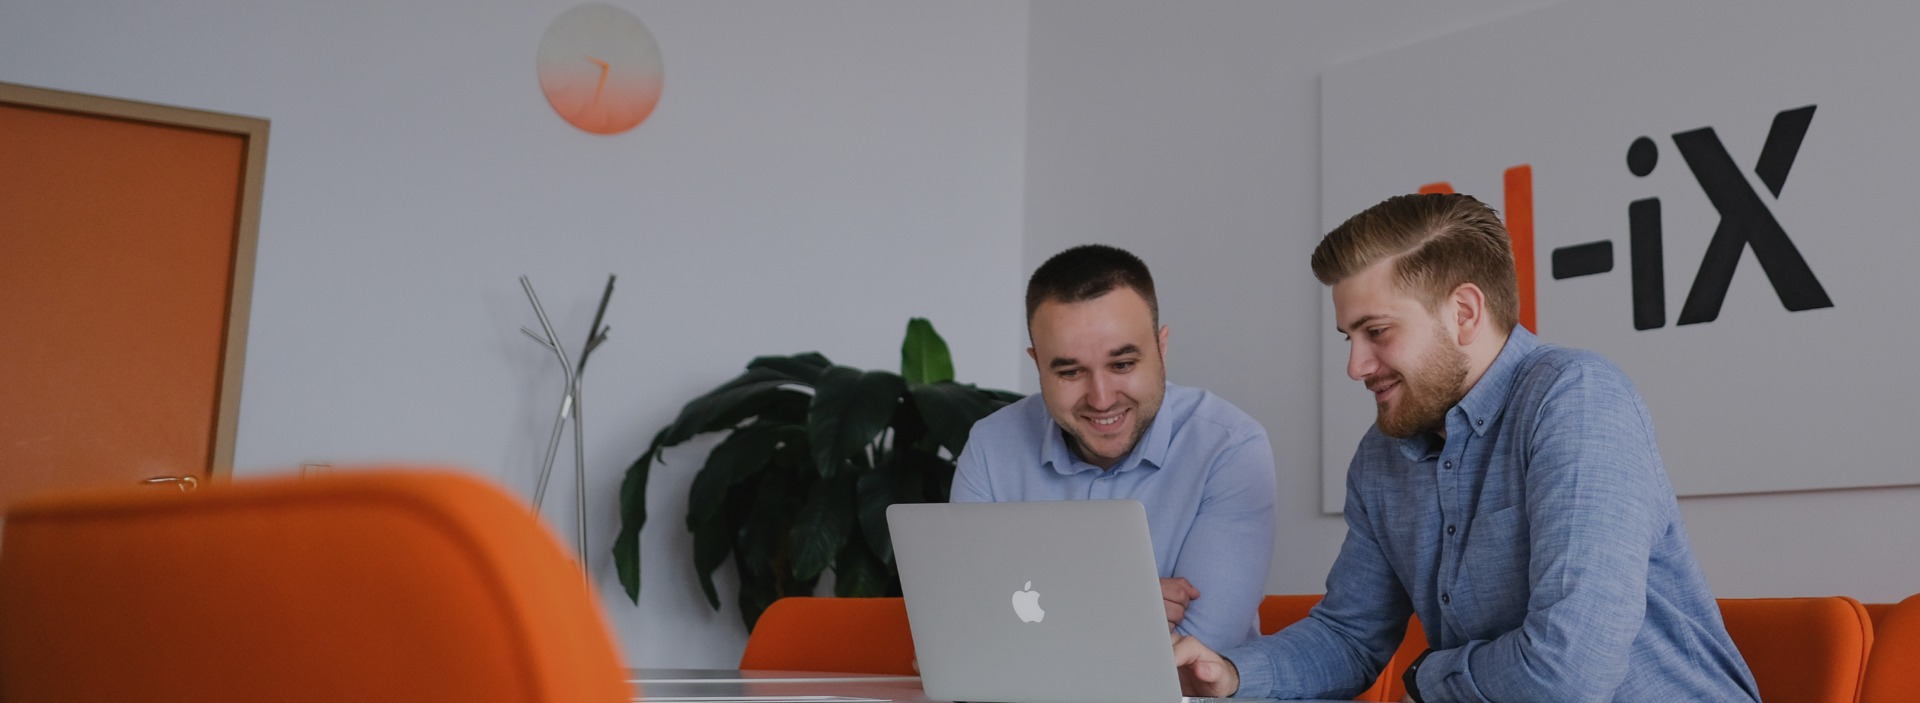 Senior-to-Senior mentorship story: Yurii and Volodymyr share experience